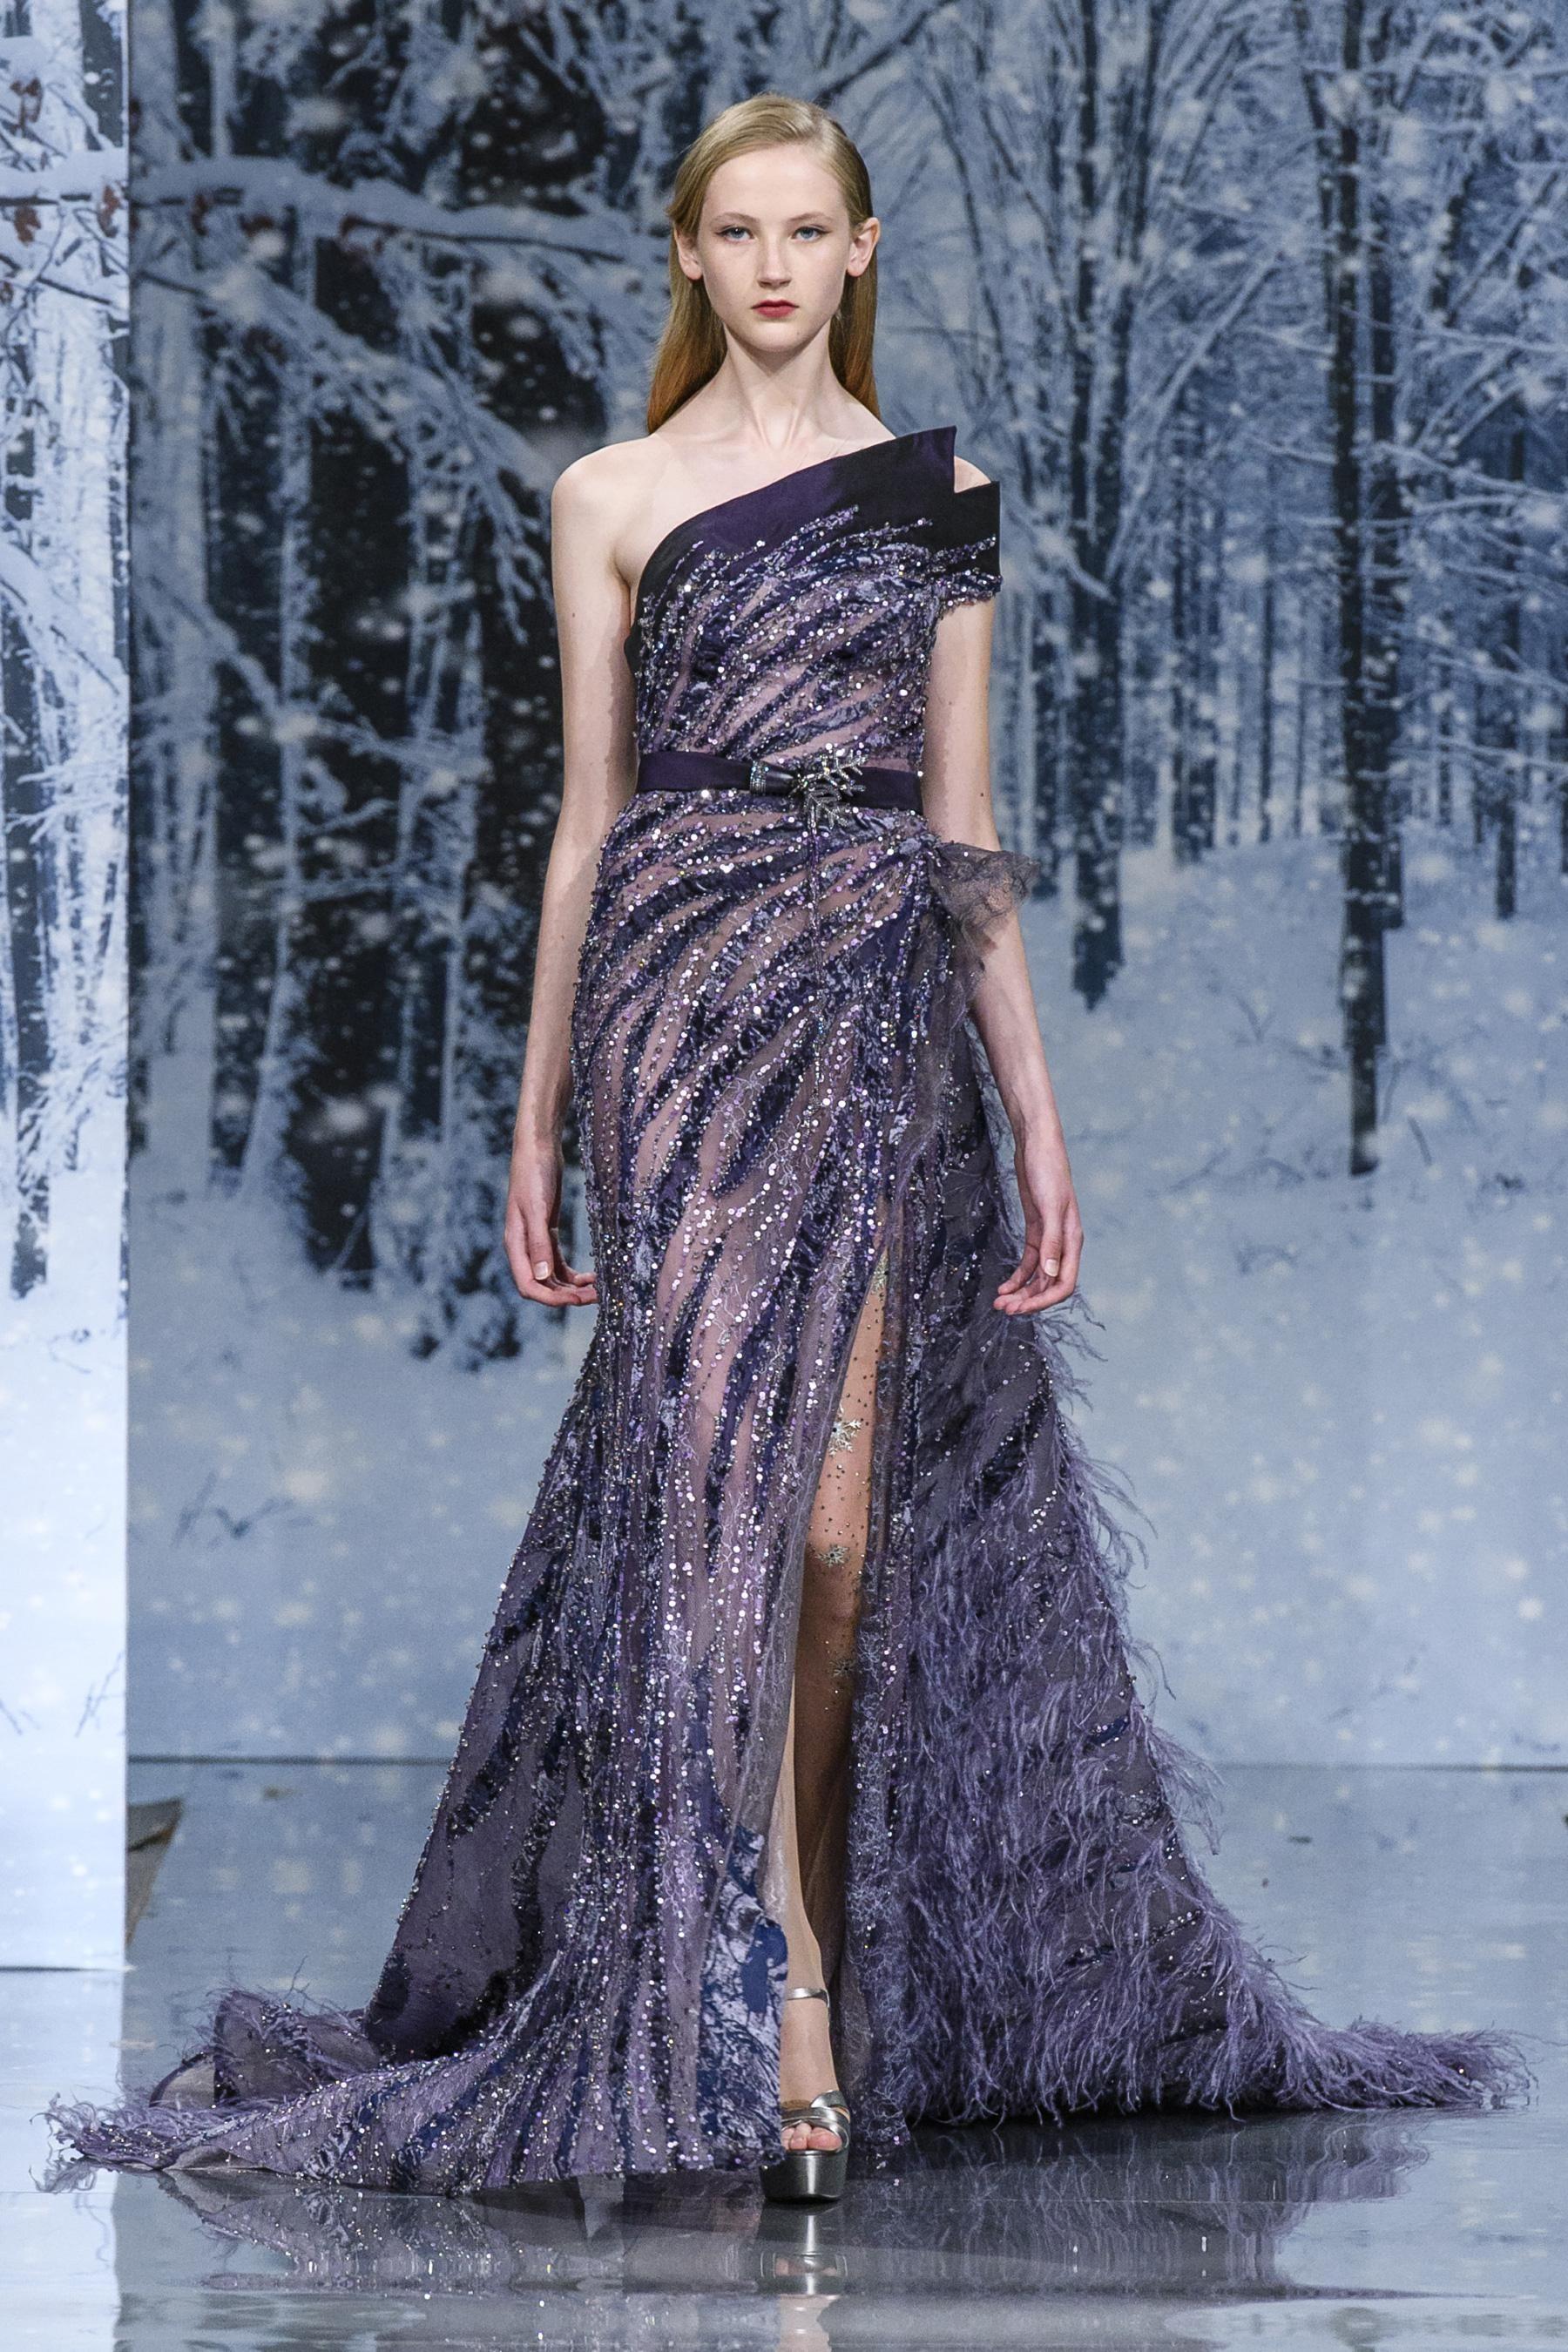 Défilé Ziad Nakad Automne-hiver 2017-2018 Haute couture | Vestiditos